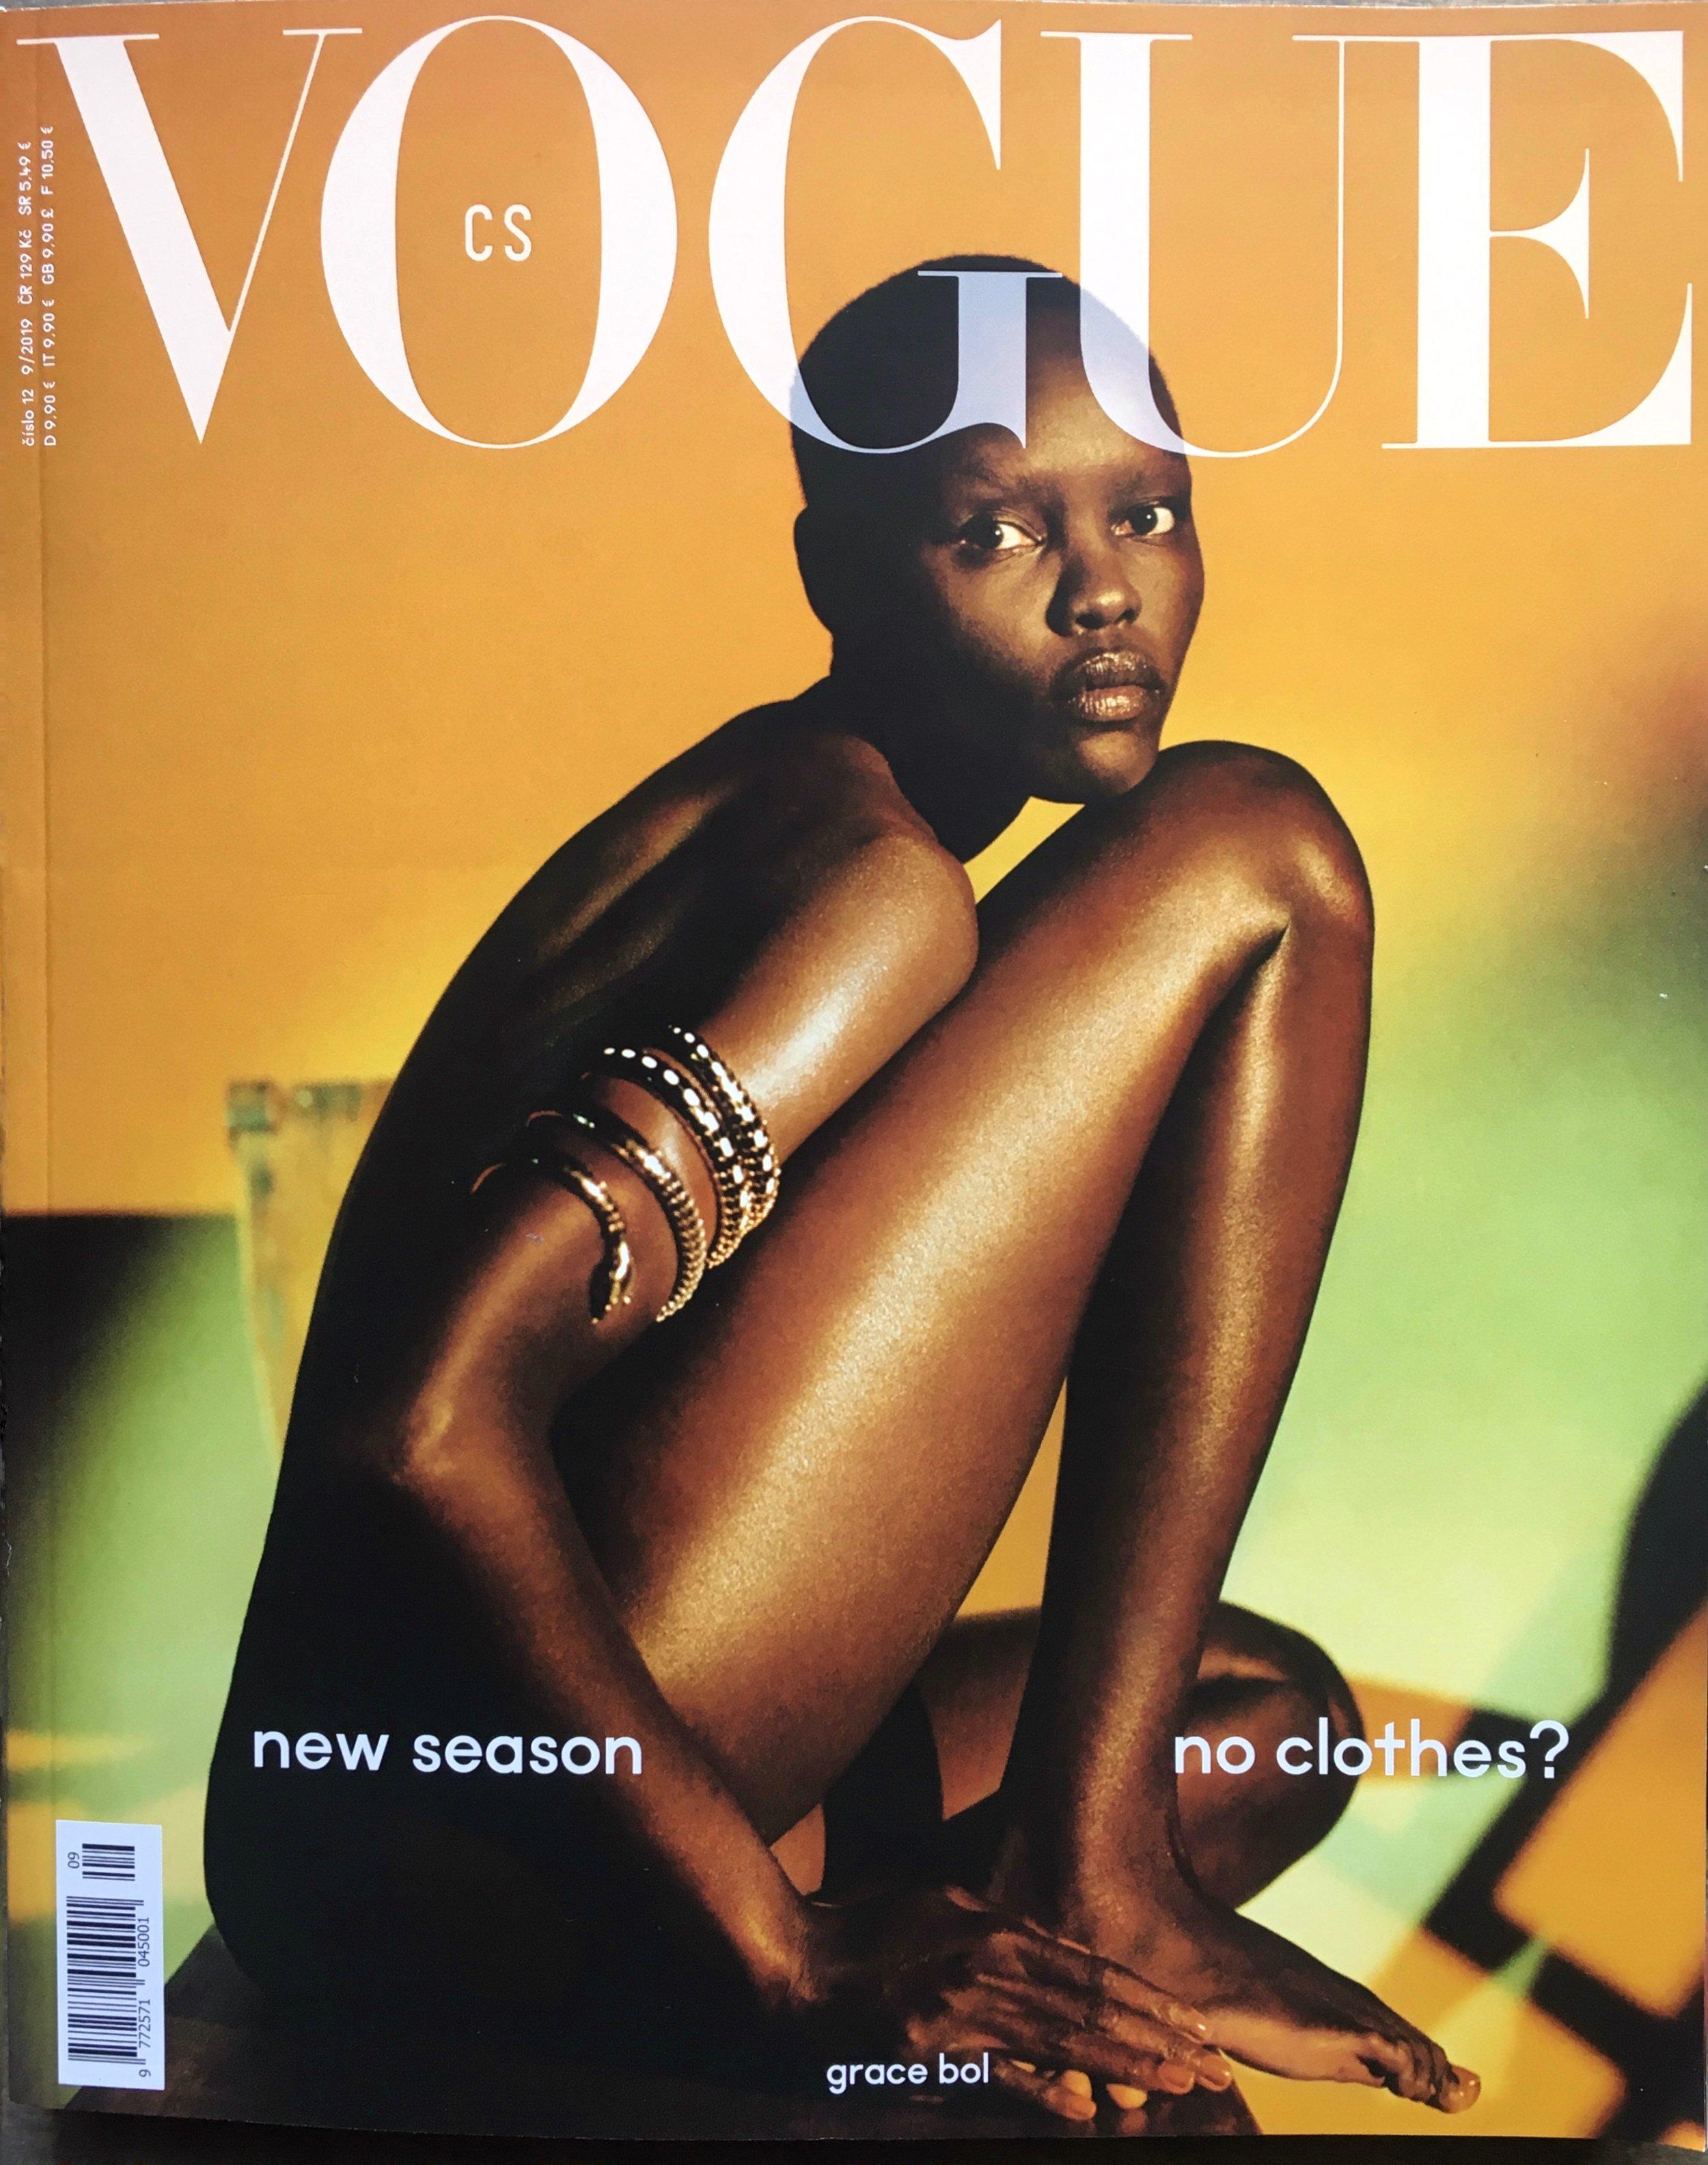 Vogue - formafatal